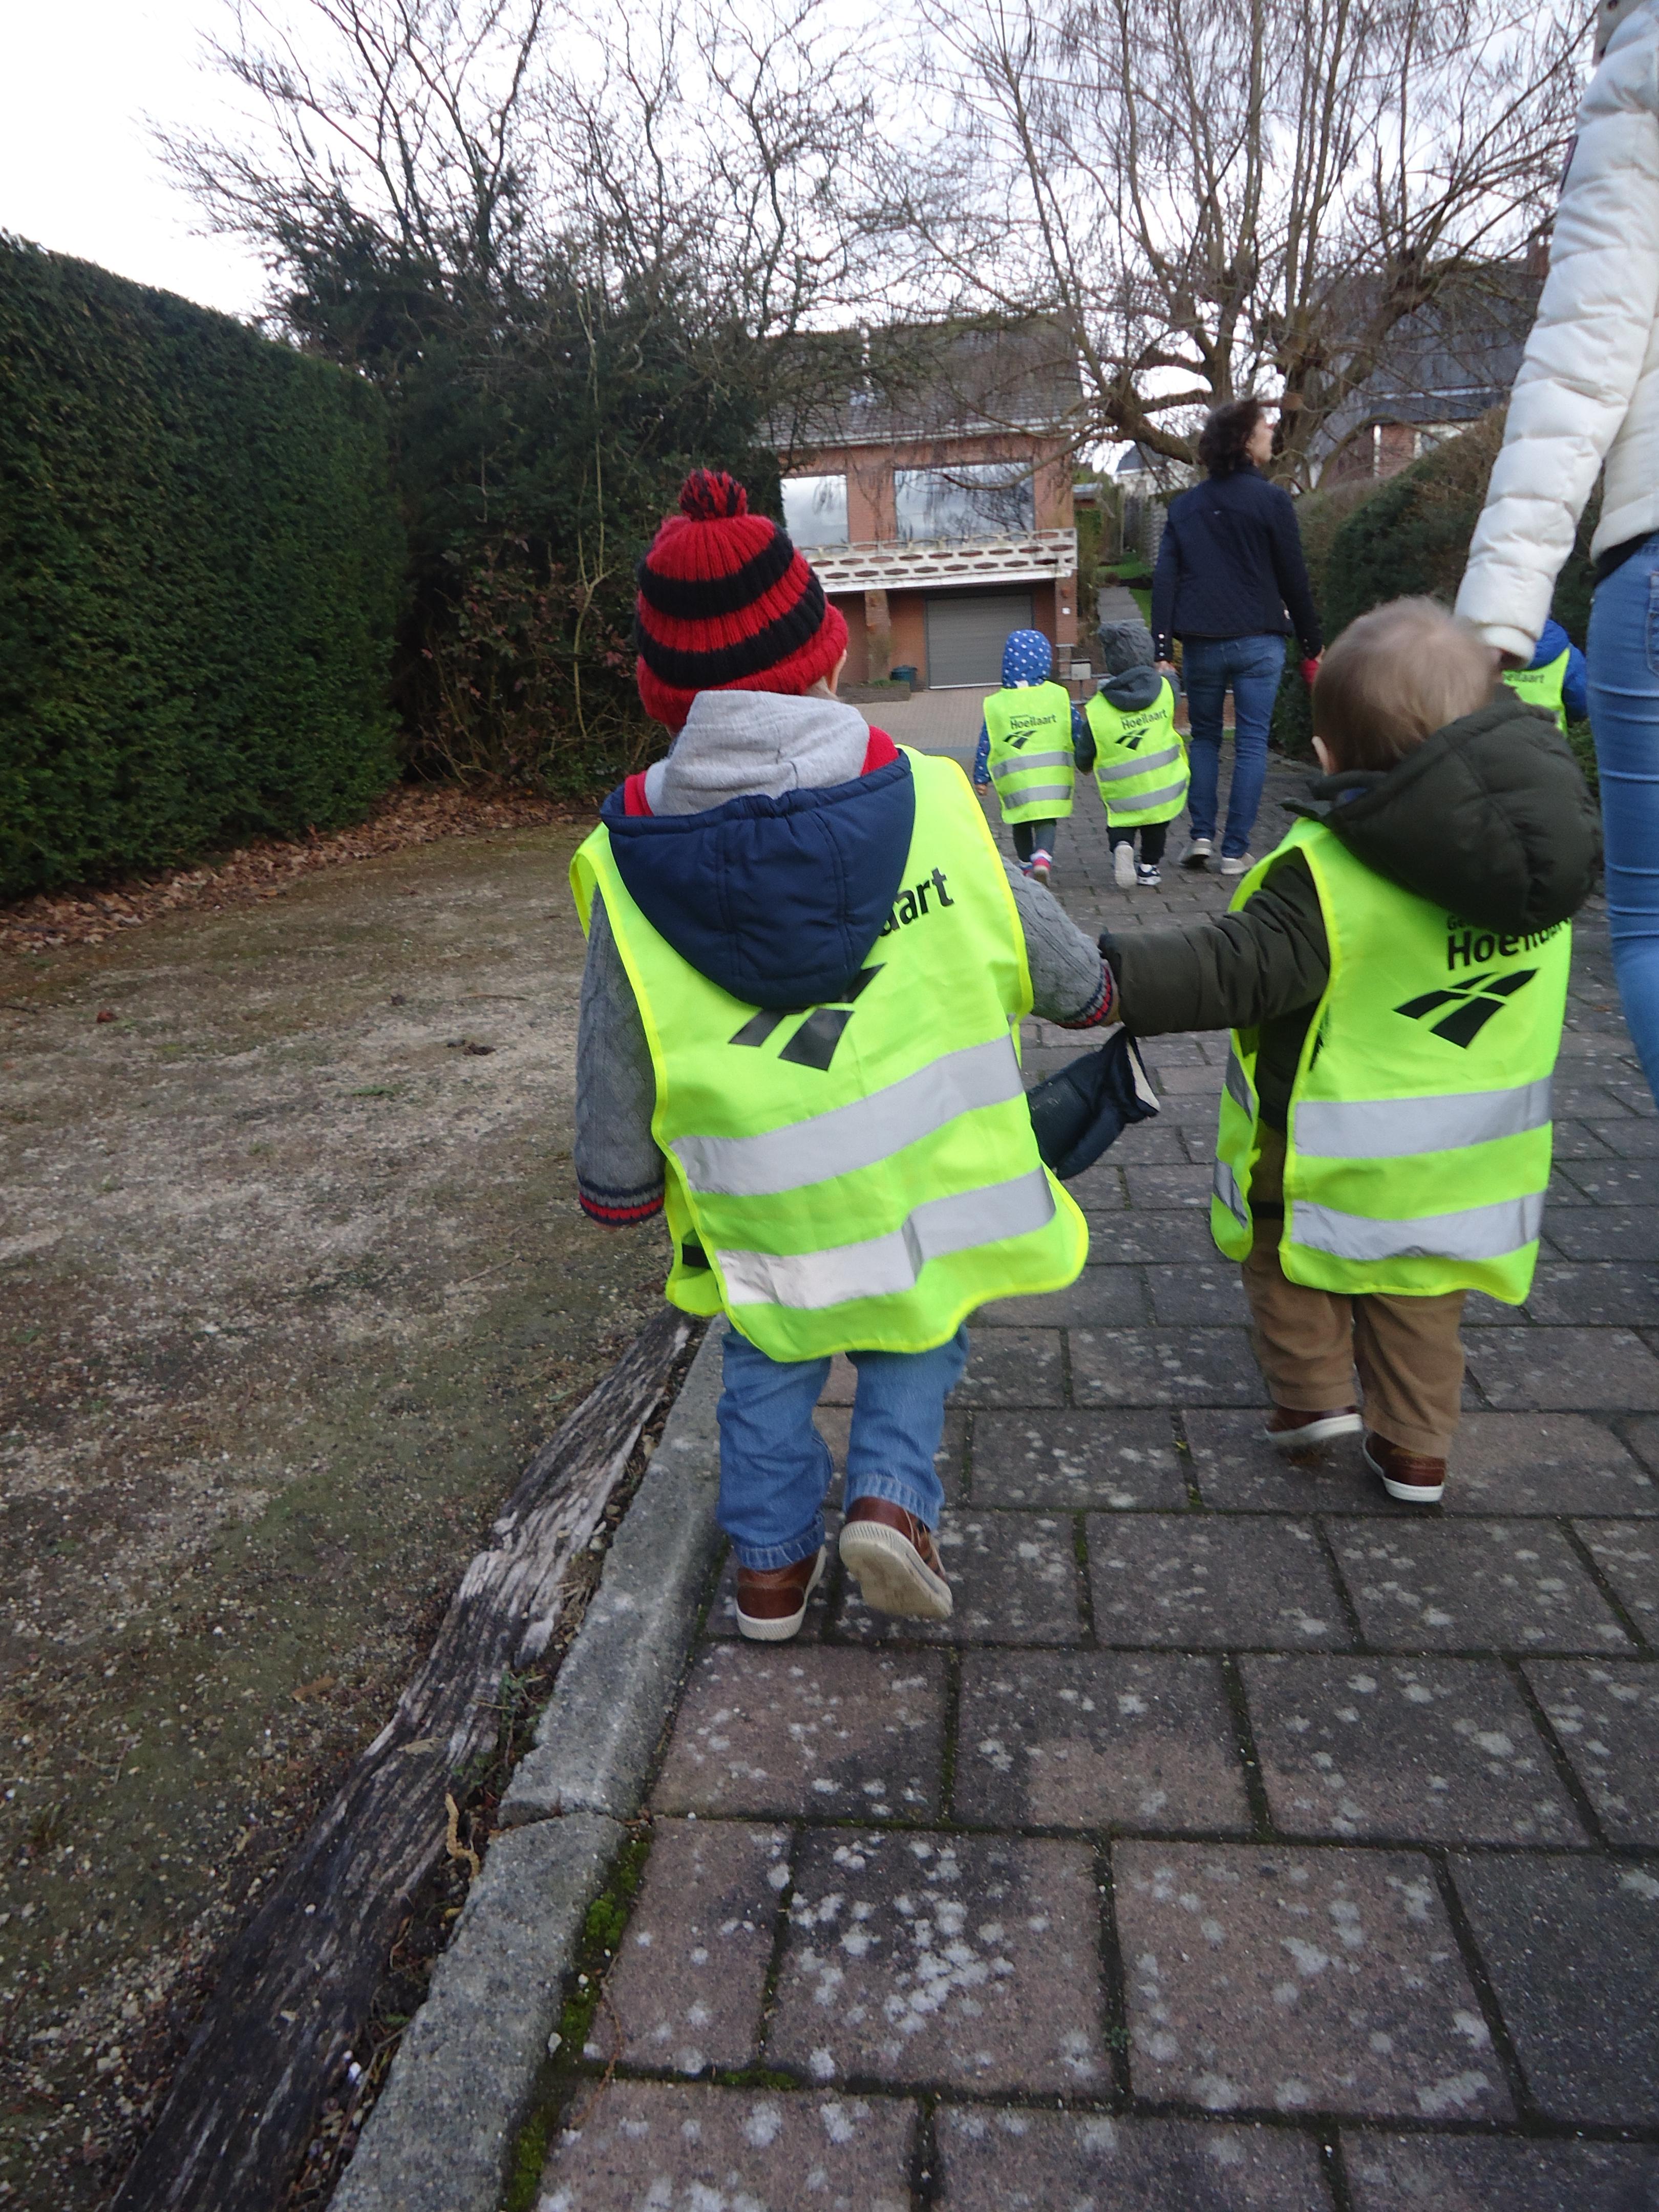 Wandeling kinderdagverblijf-3